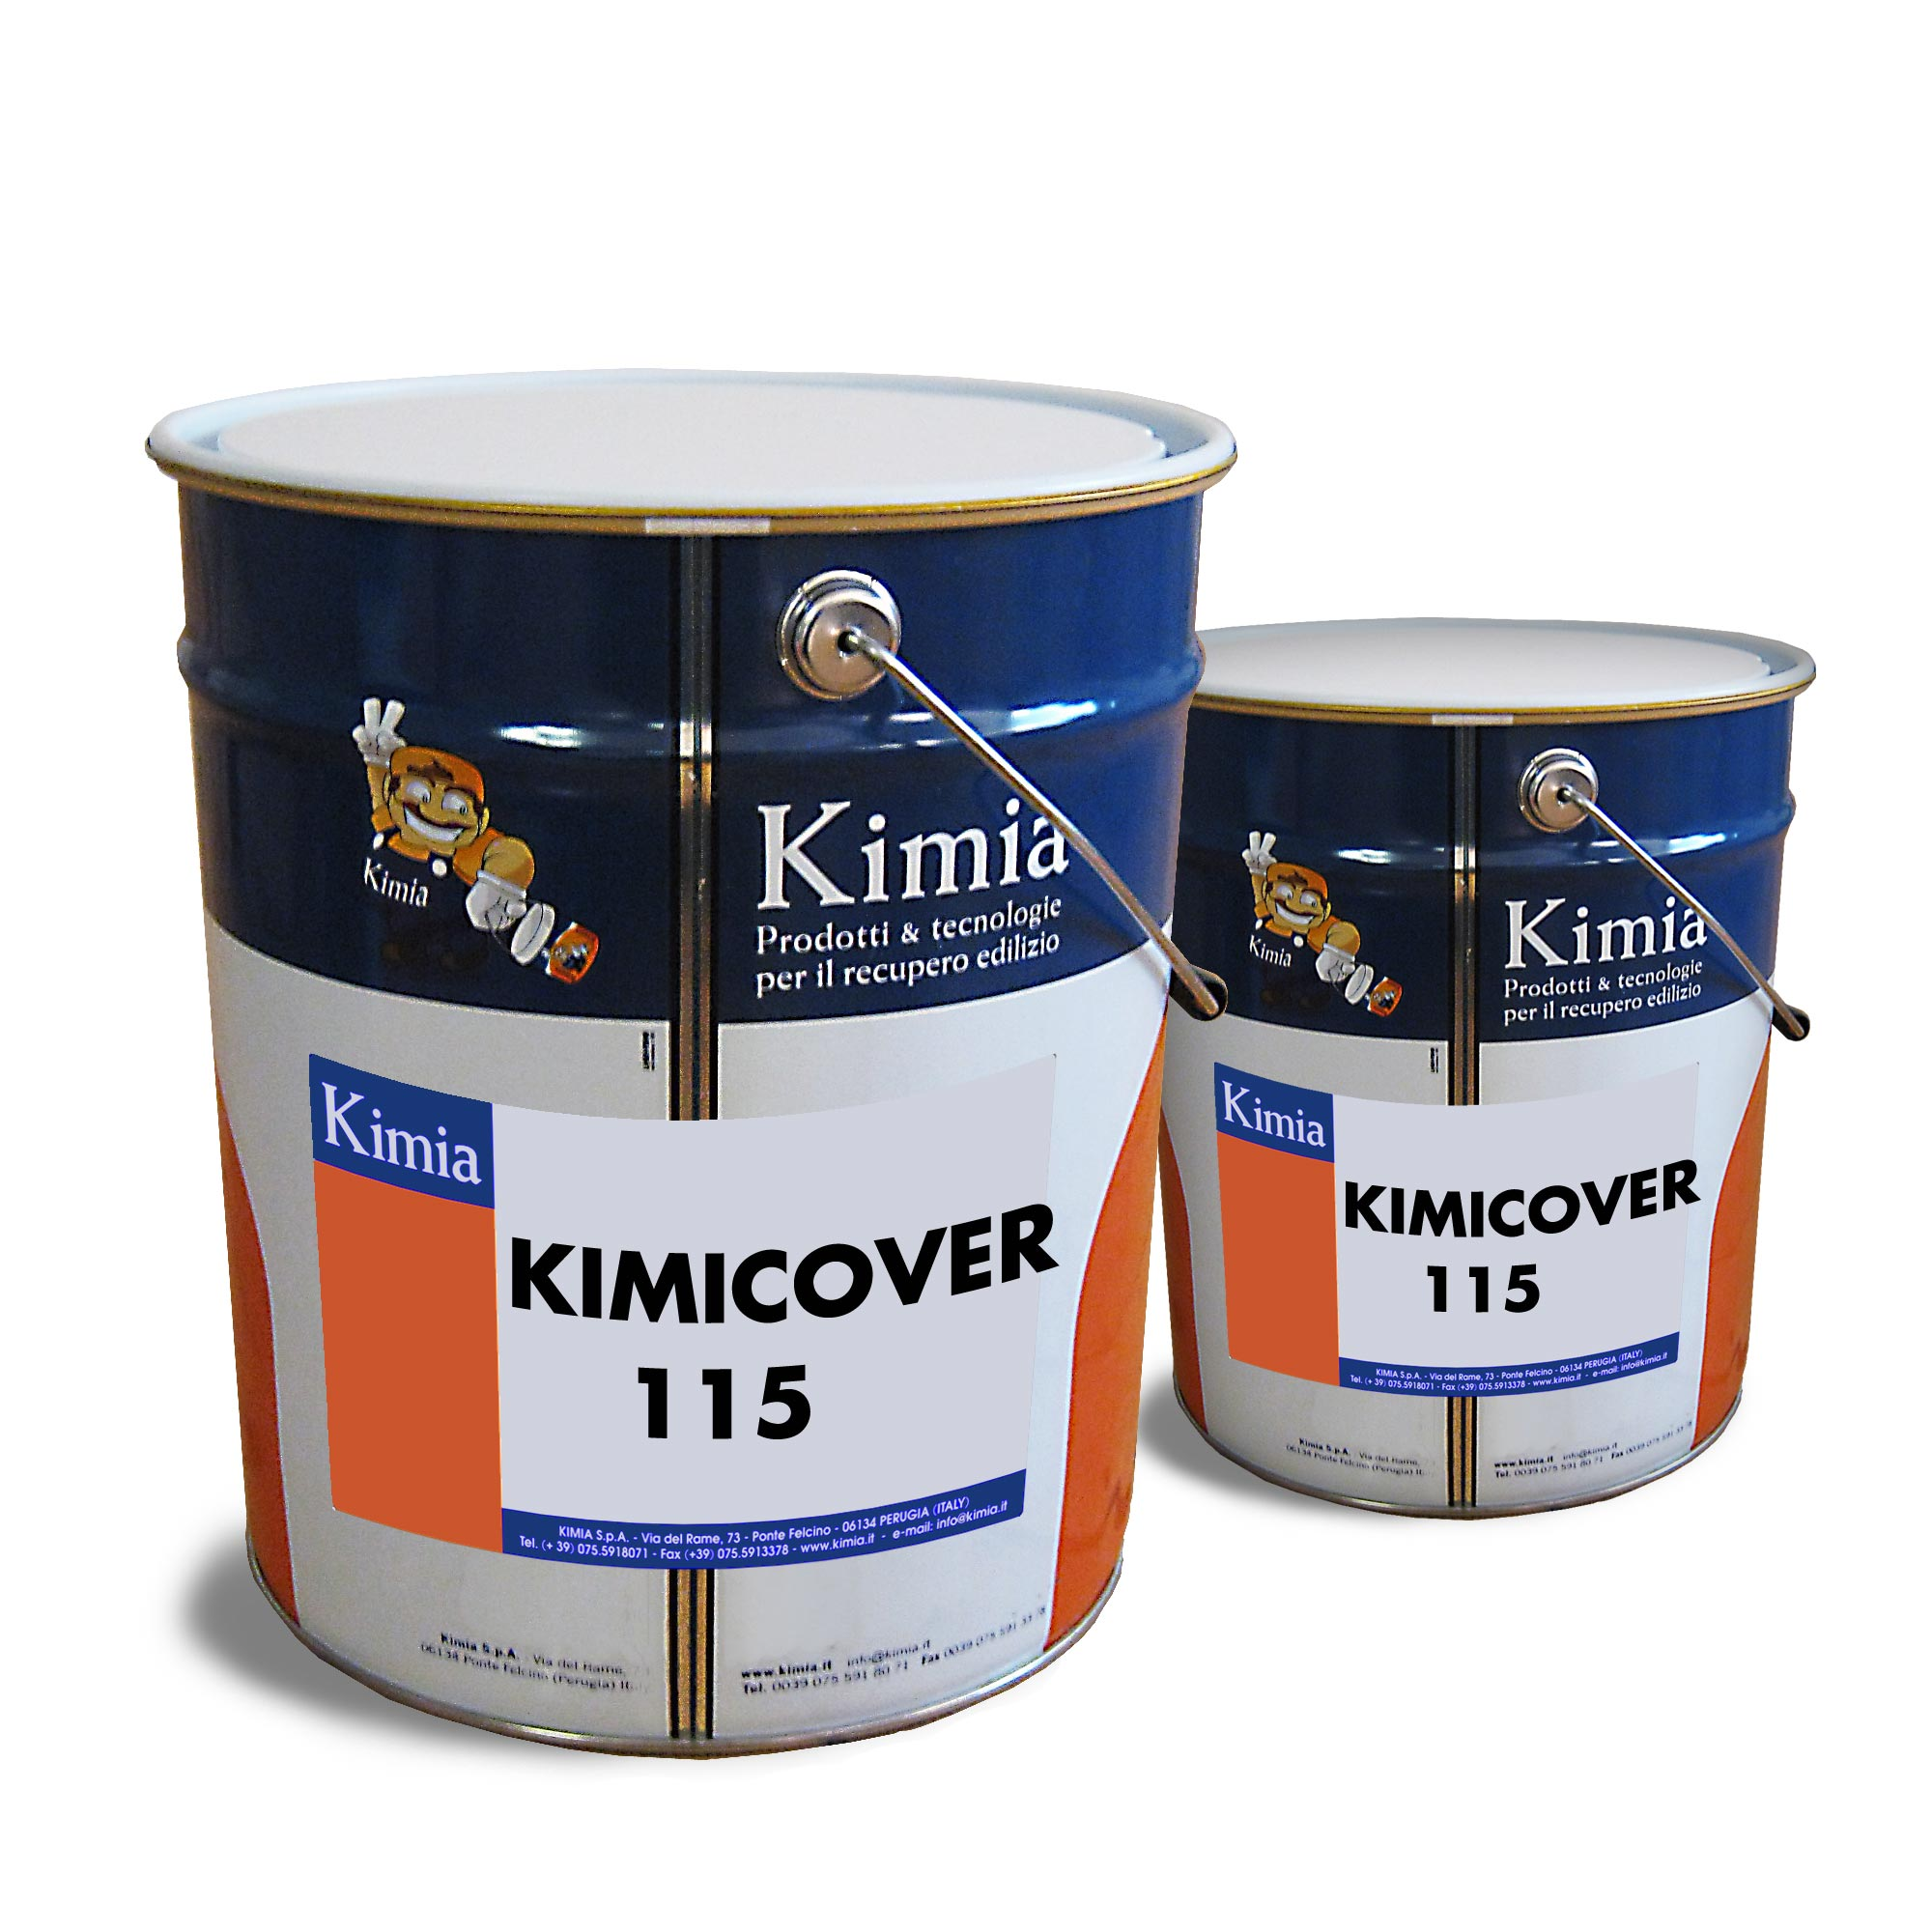 Kimicover 115